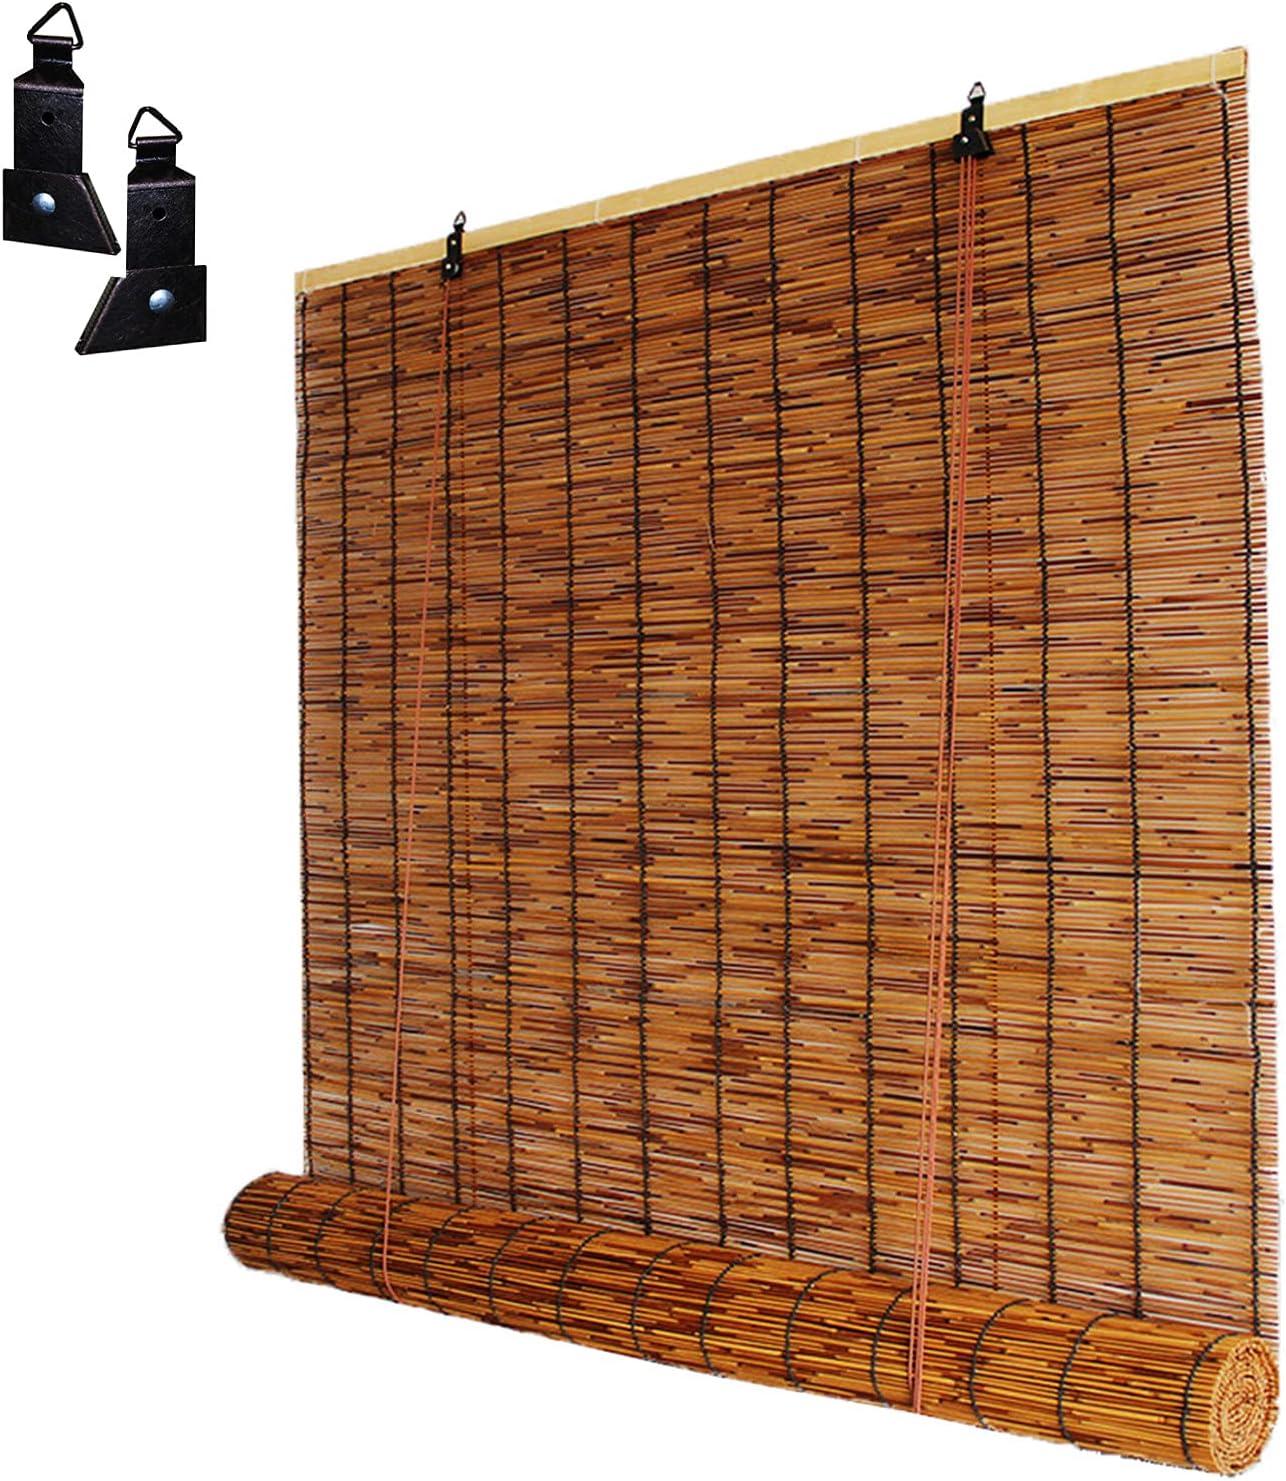 OHKKSD Bamboo Roller Shades Natural Retro Decorativ Curtain 日本最大級の品揃え 超人気 専門店 Reed